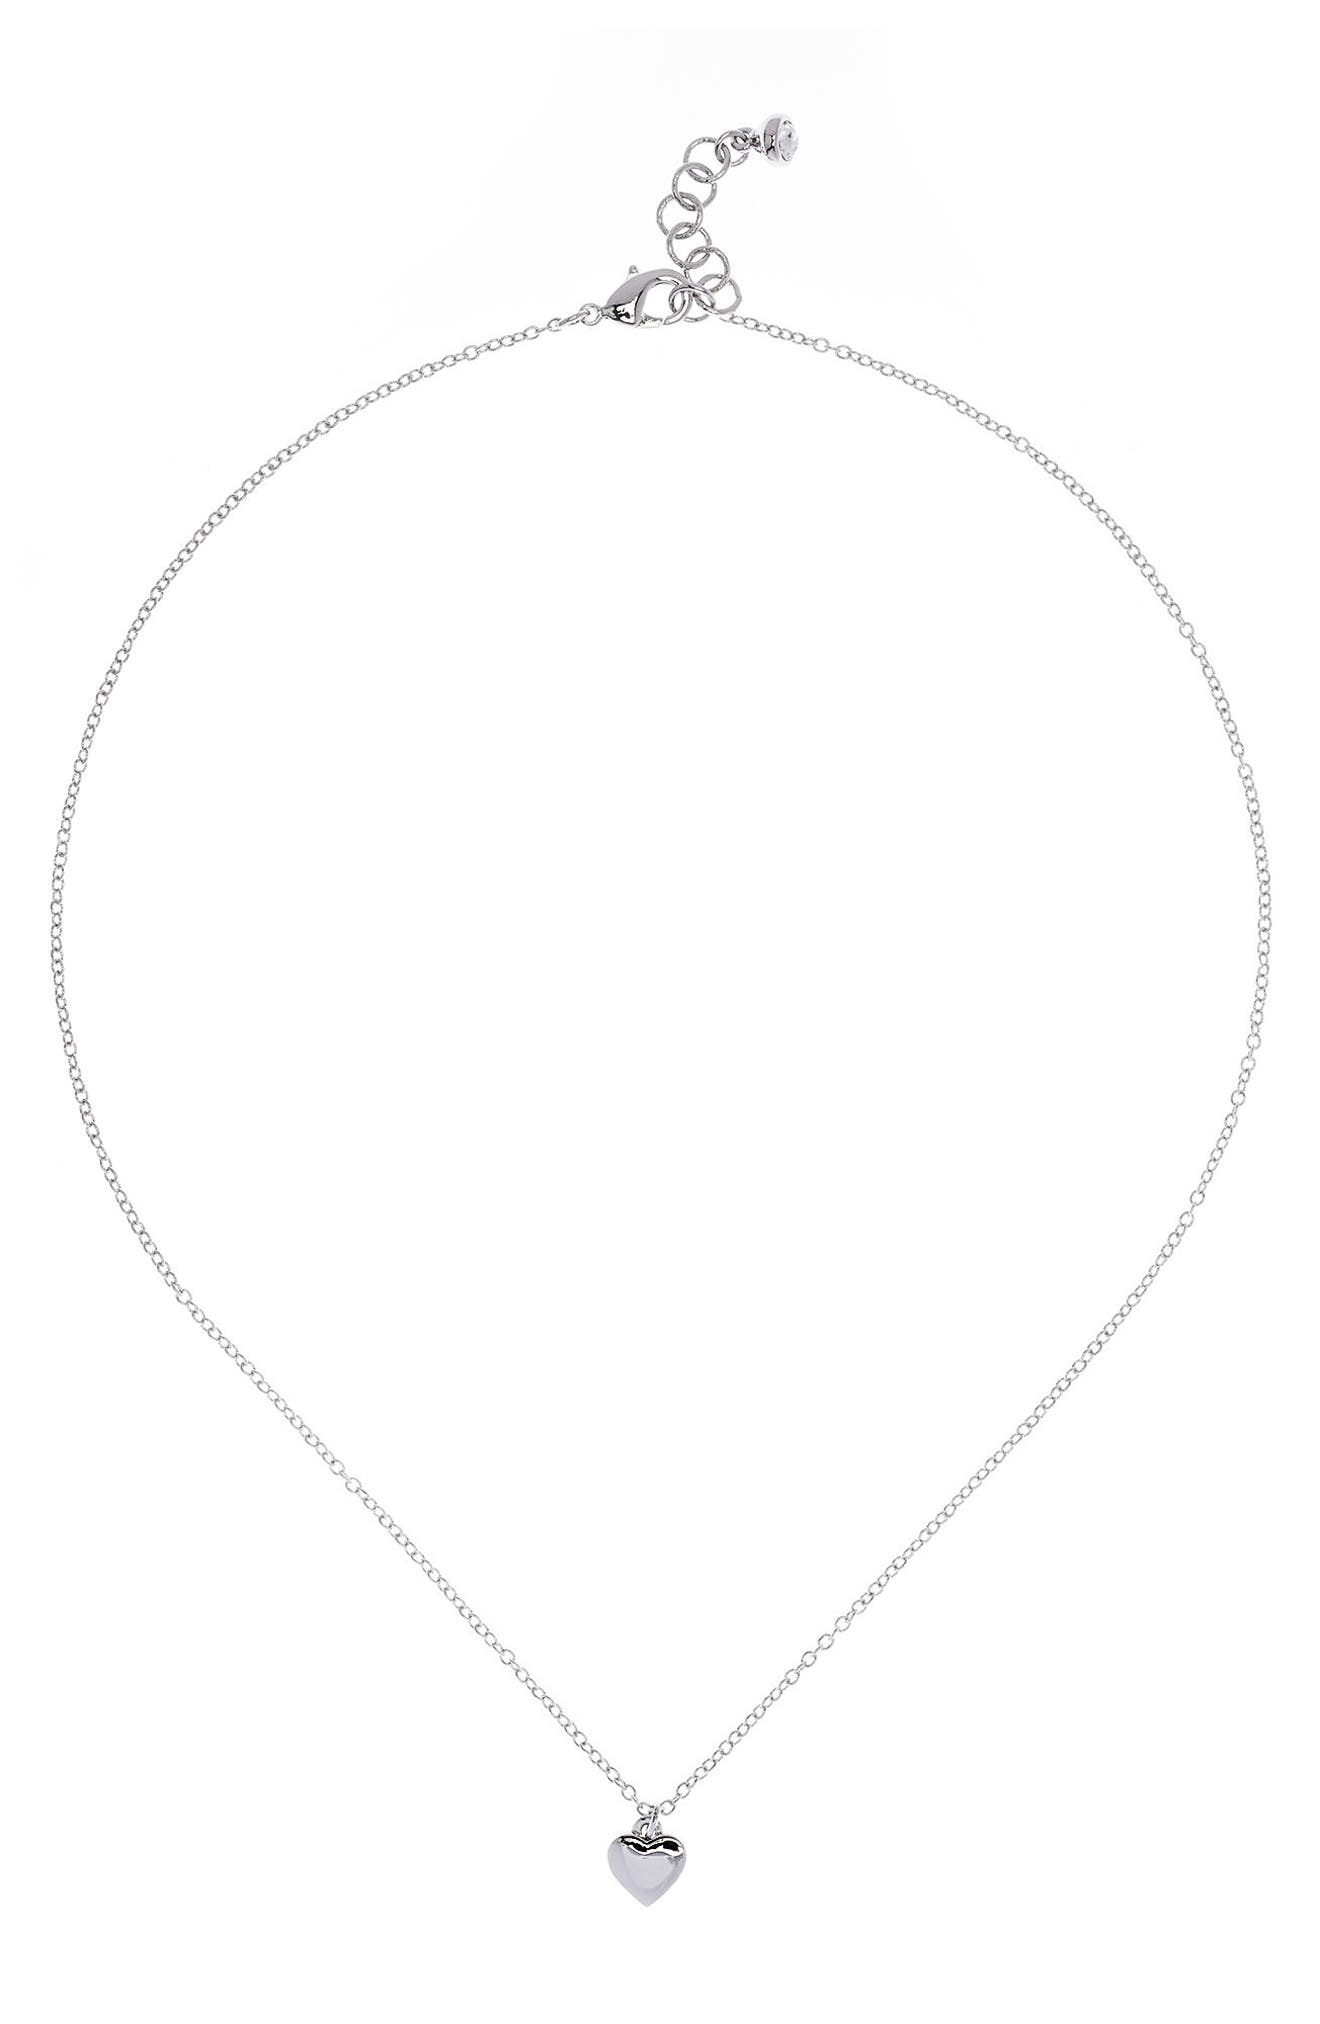 Mini Heart Pendant Necklace,                             Alternate thumbnail 2, color,                             Silver Color